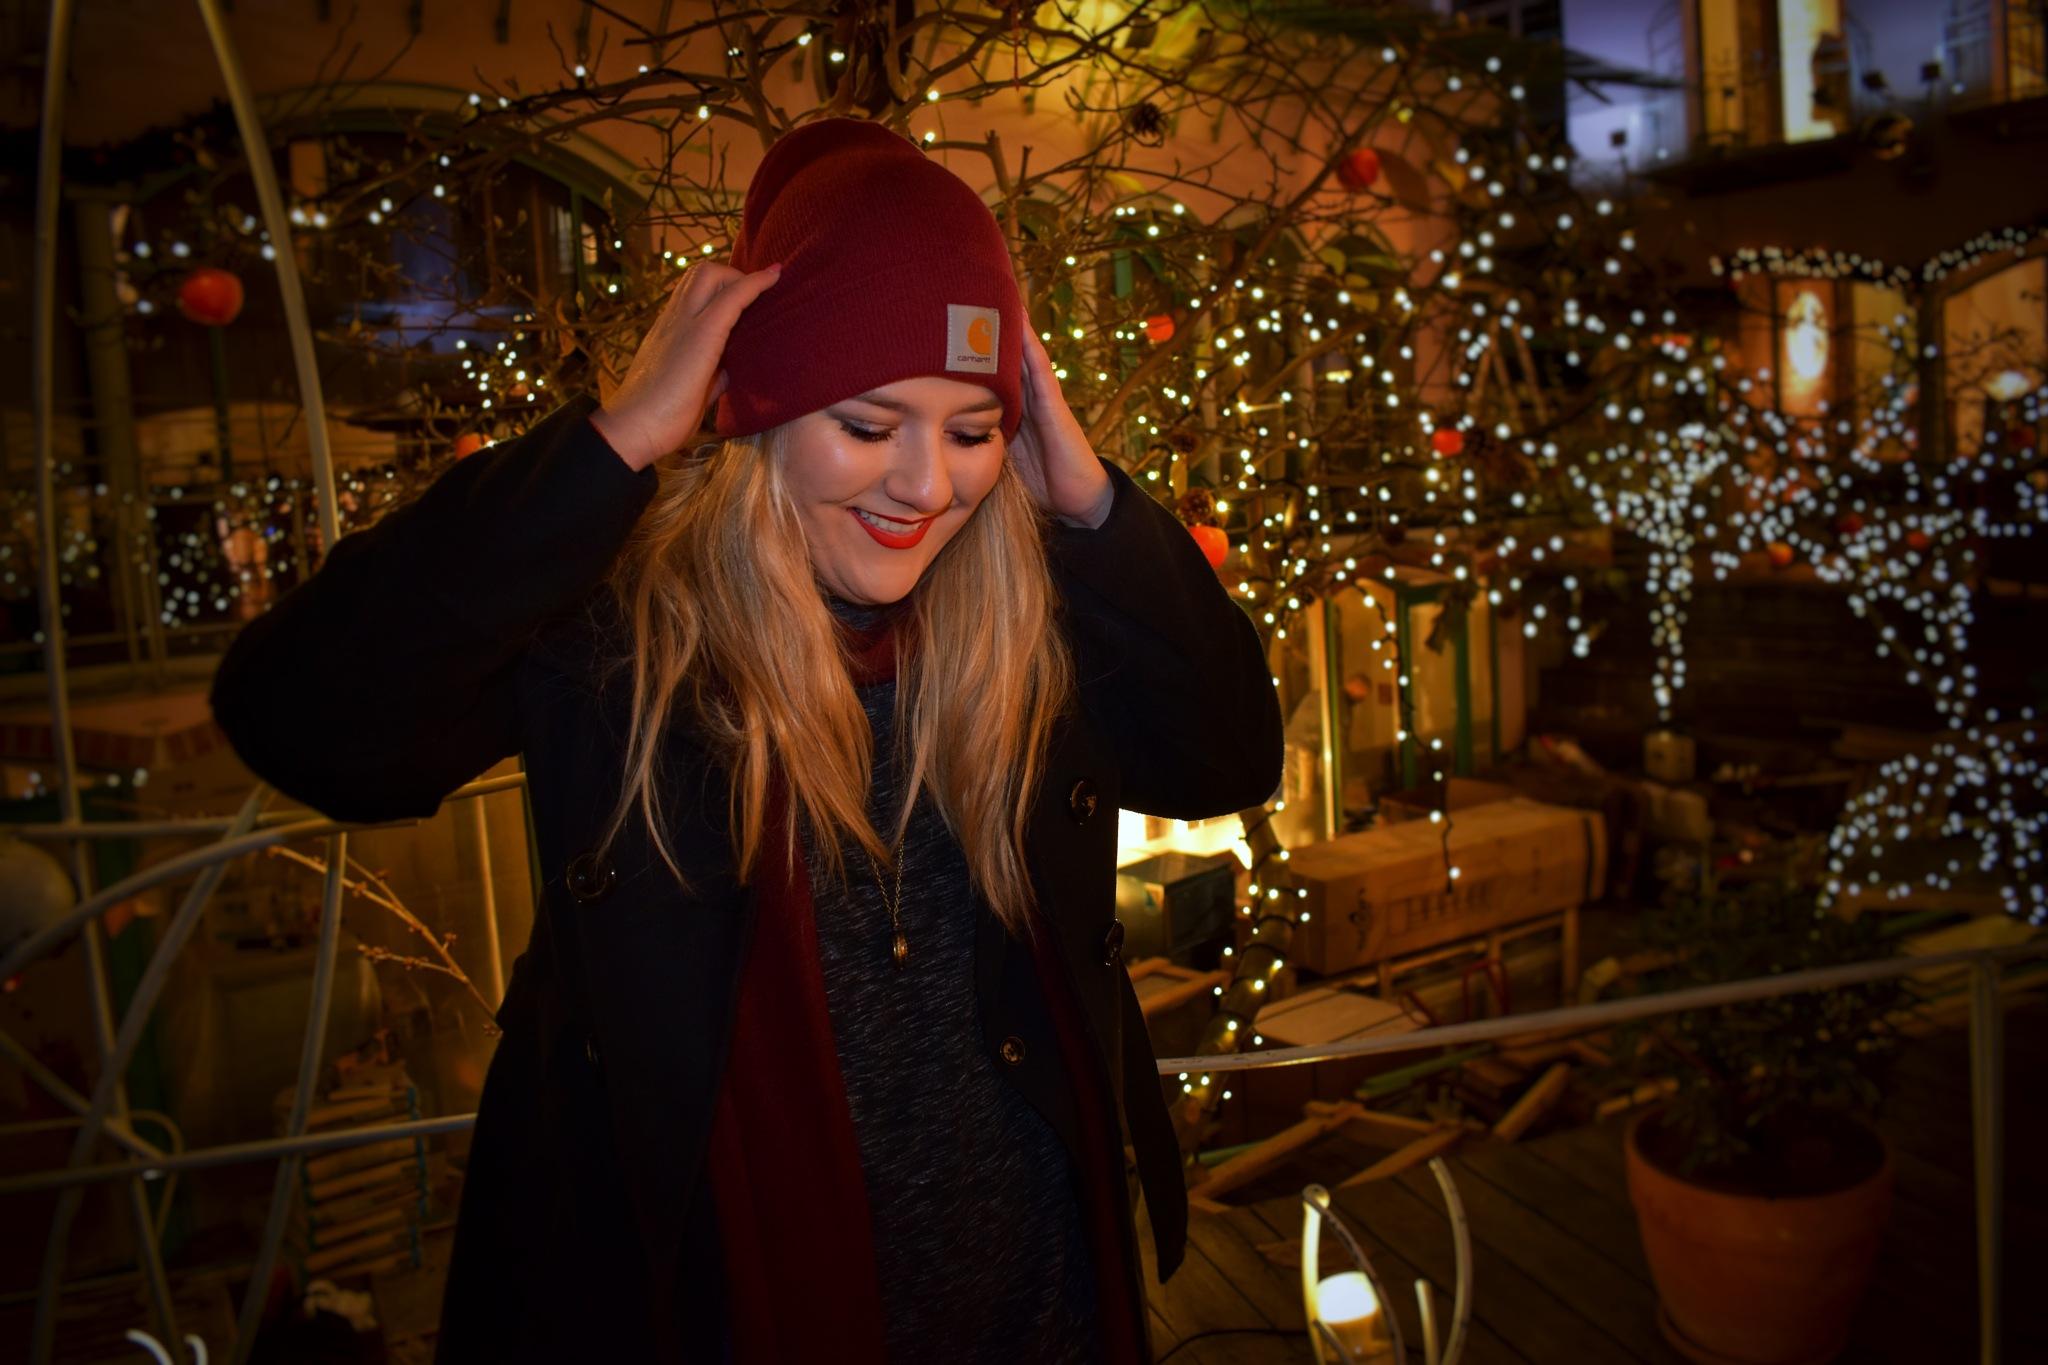 Winter stories  by Glykeria Pappa